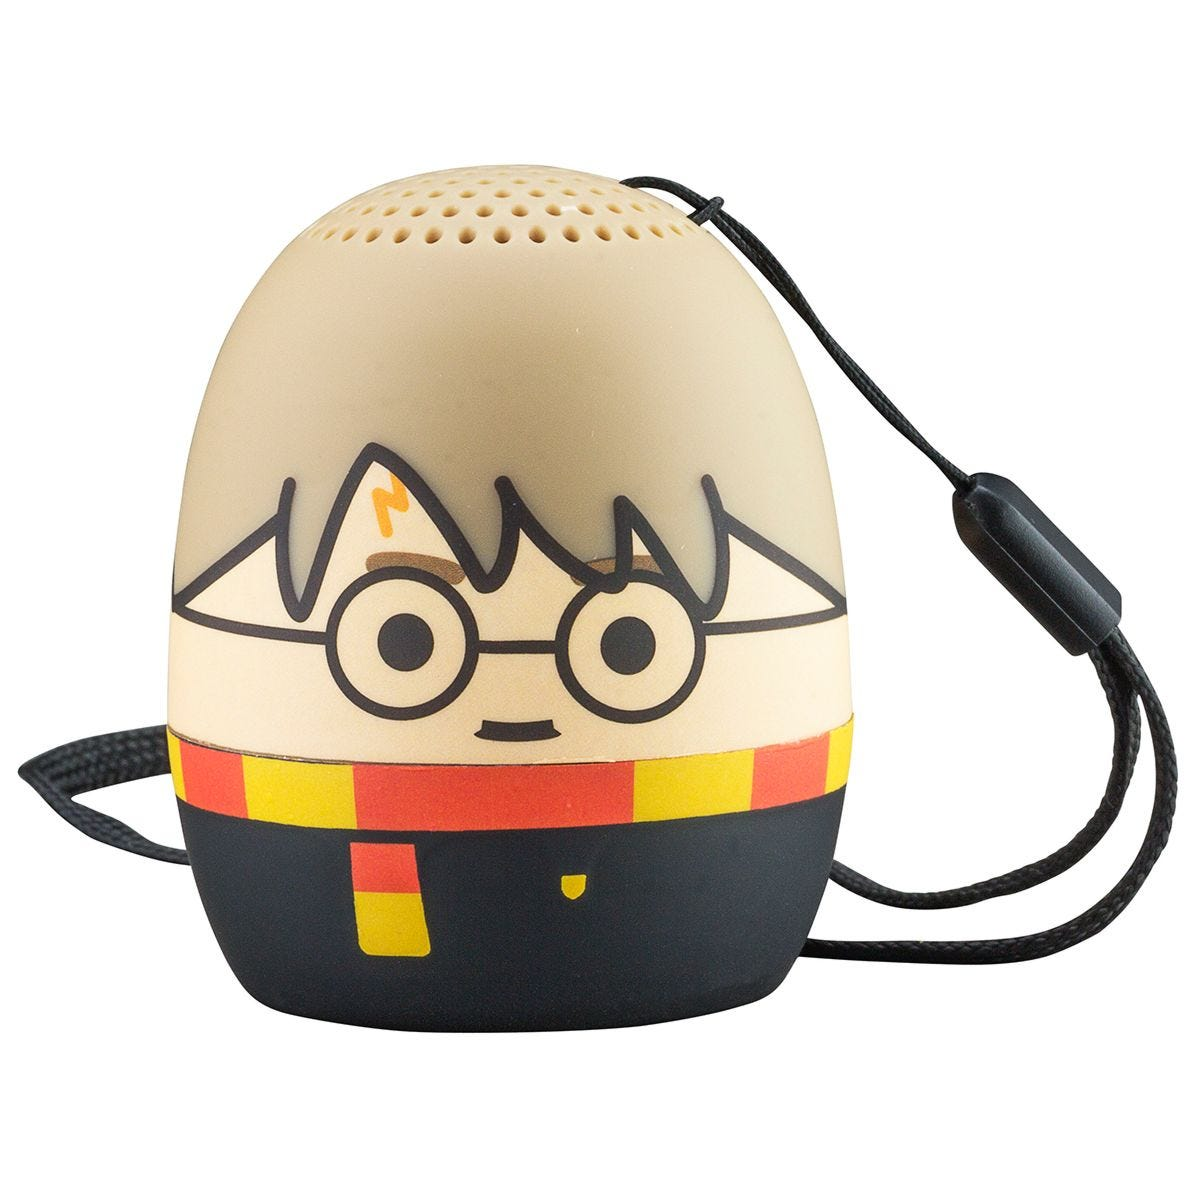 eKids Mini Harry Potter Character Portable Bluetooth Speaker